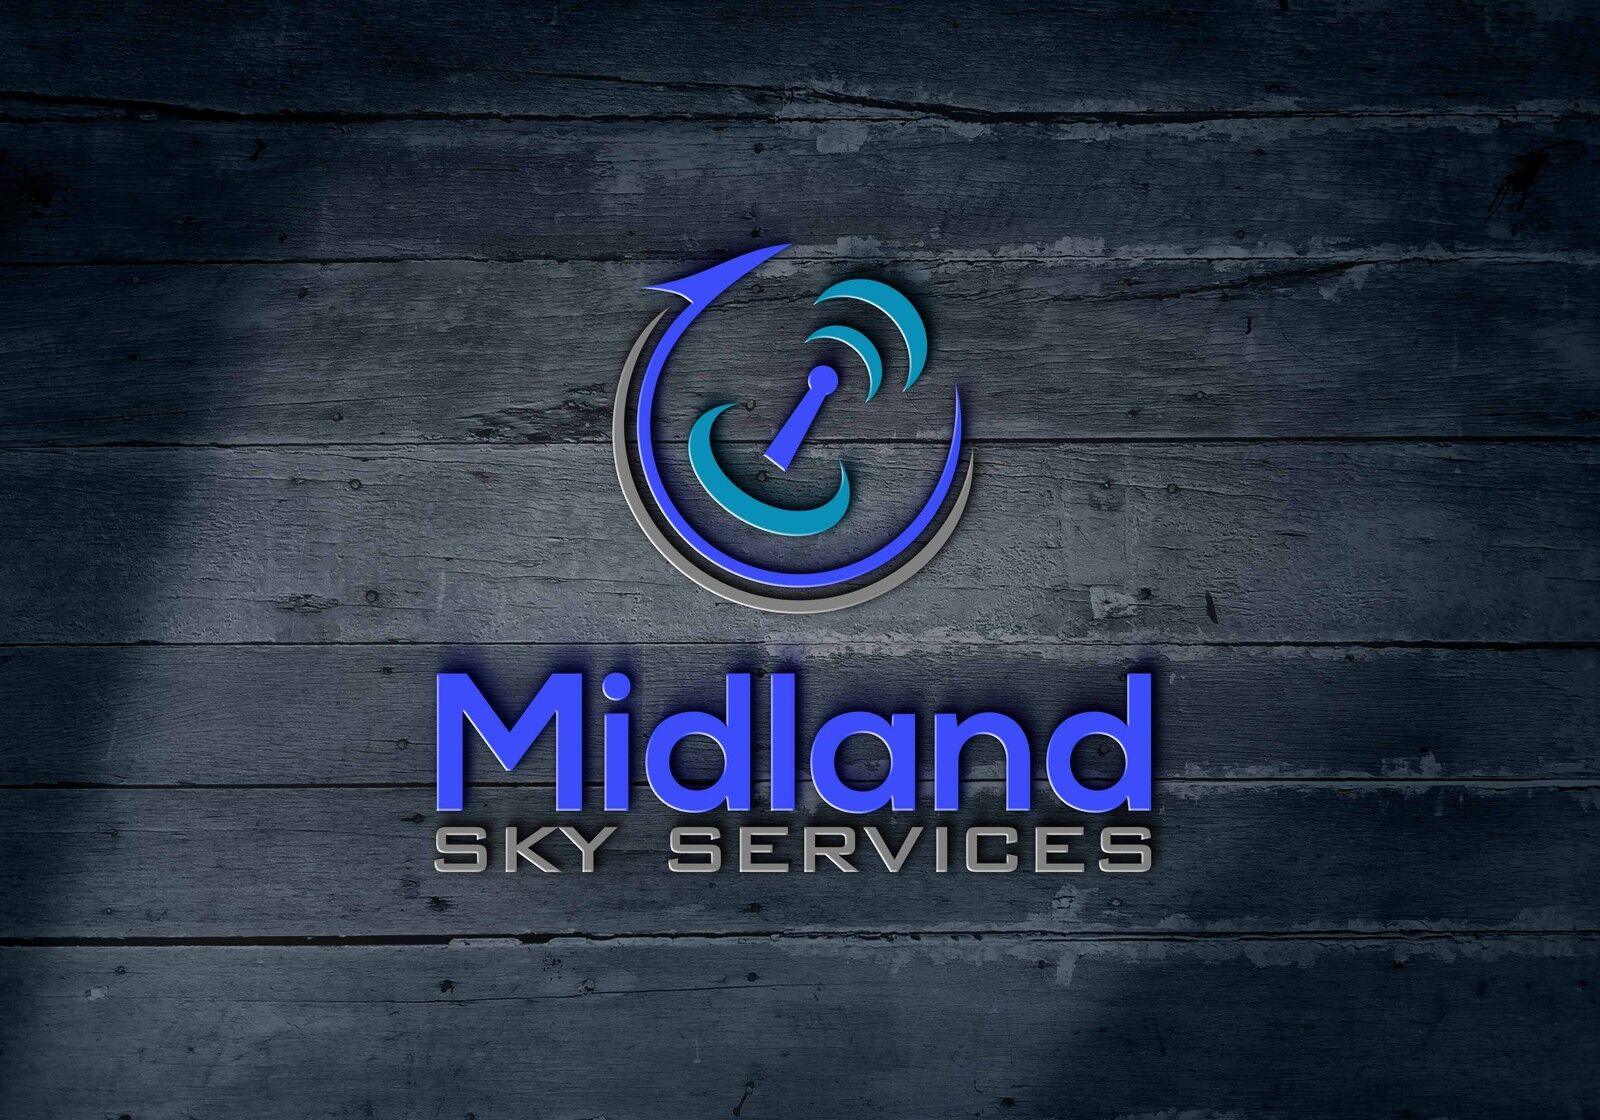 MIDLAND-SKY-SERVICES